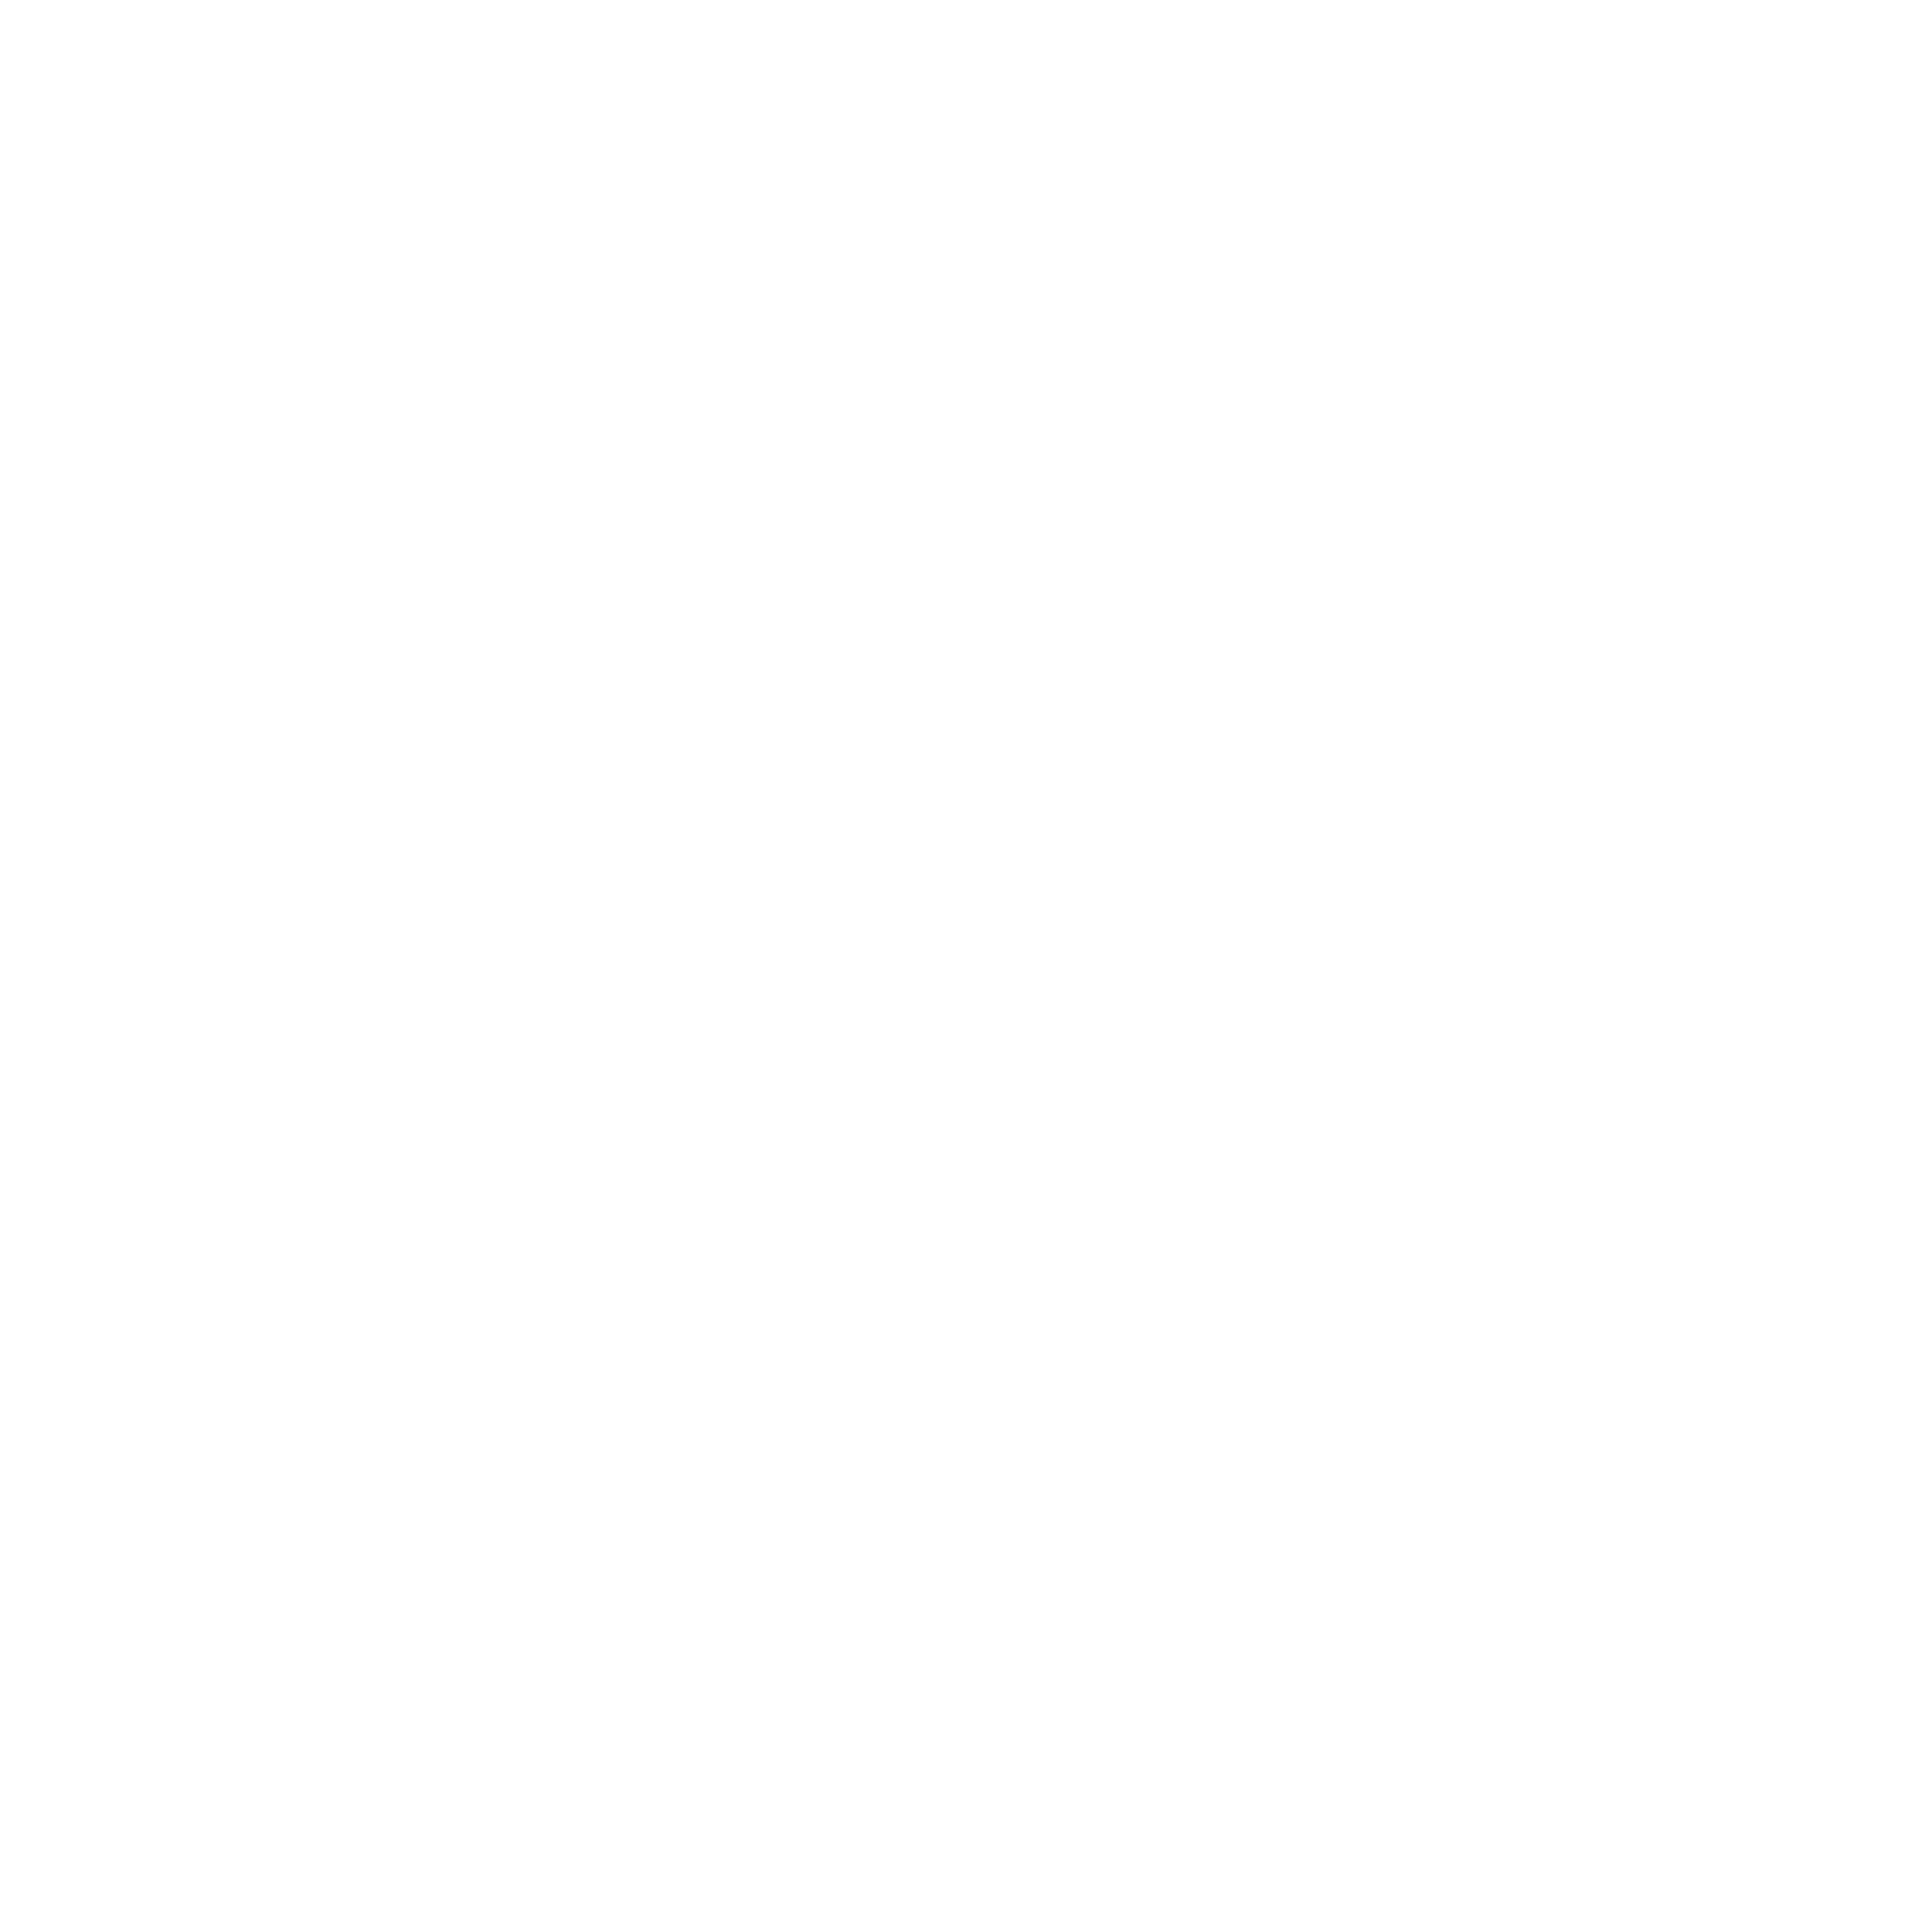 Nachricht per WhatsApp